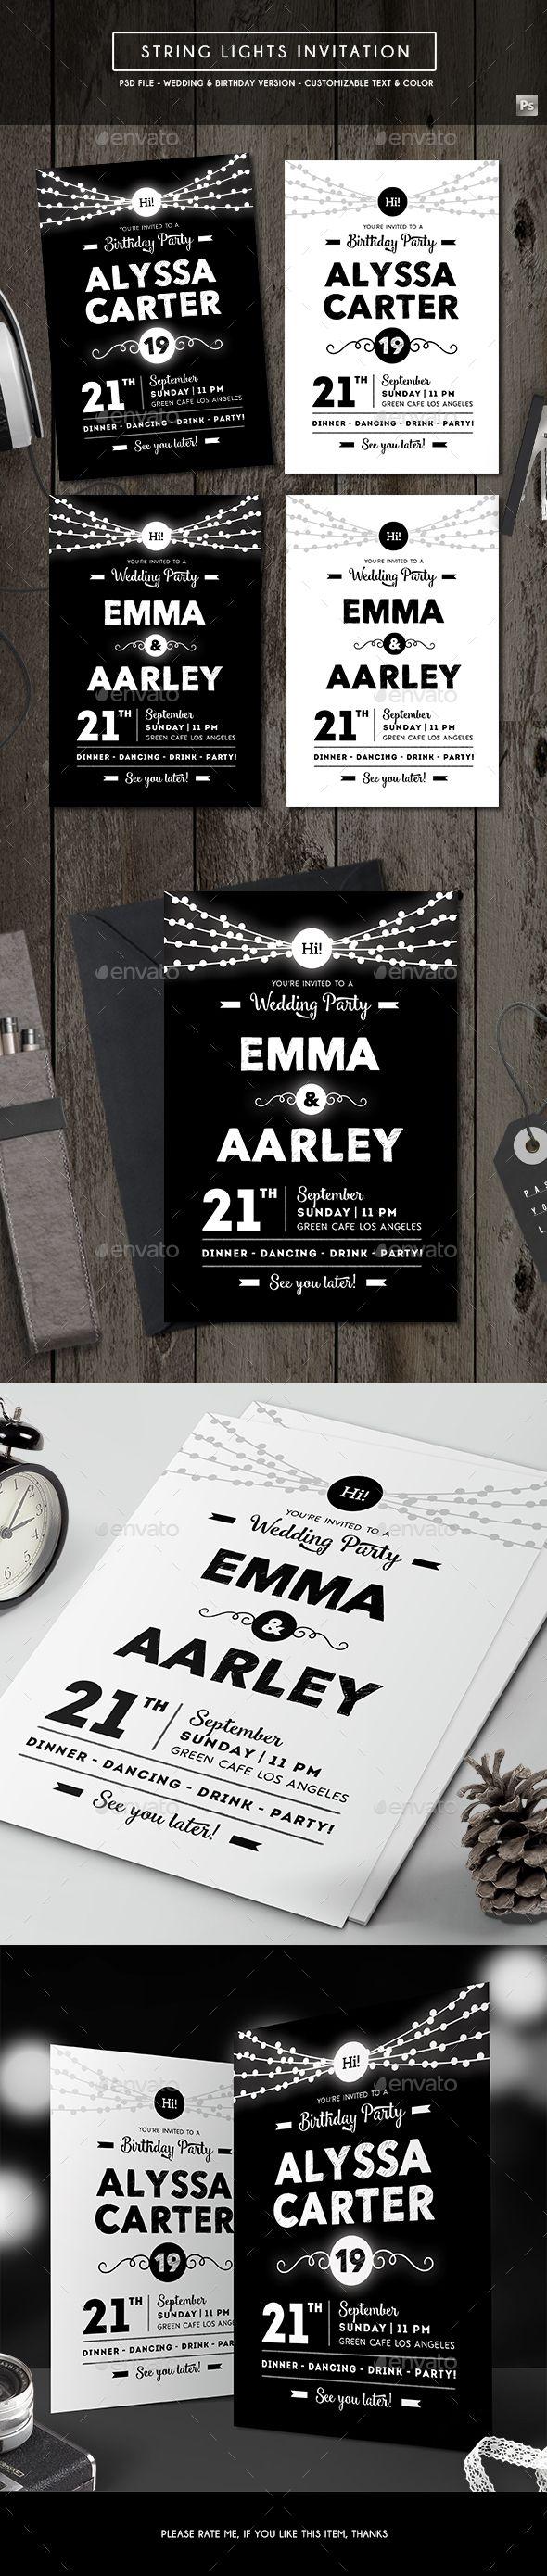 672 best Invitation Template images on Pinterest | Design patterns ...